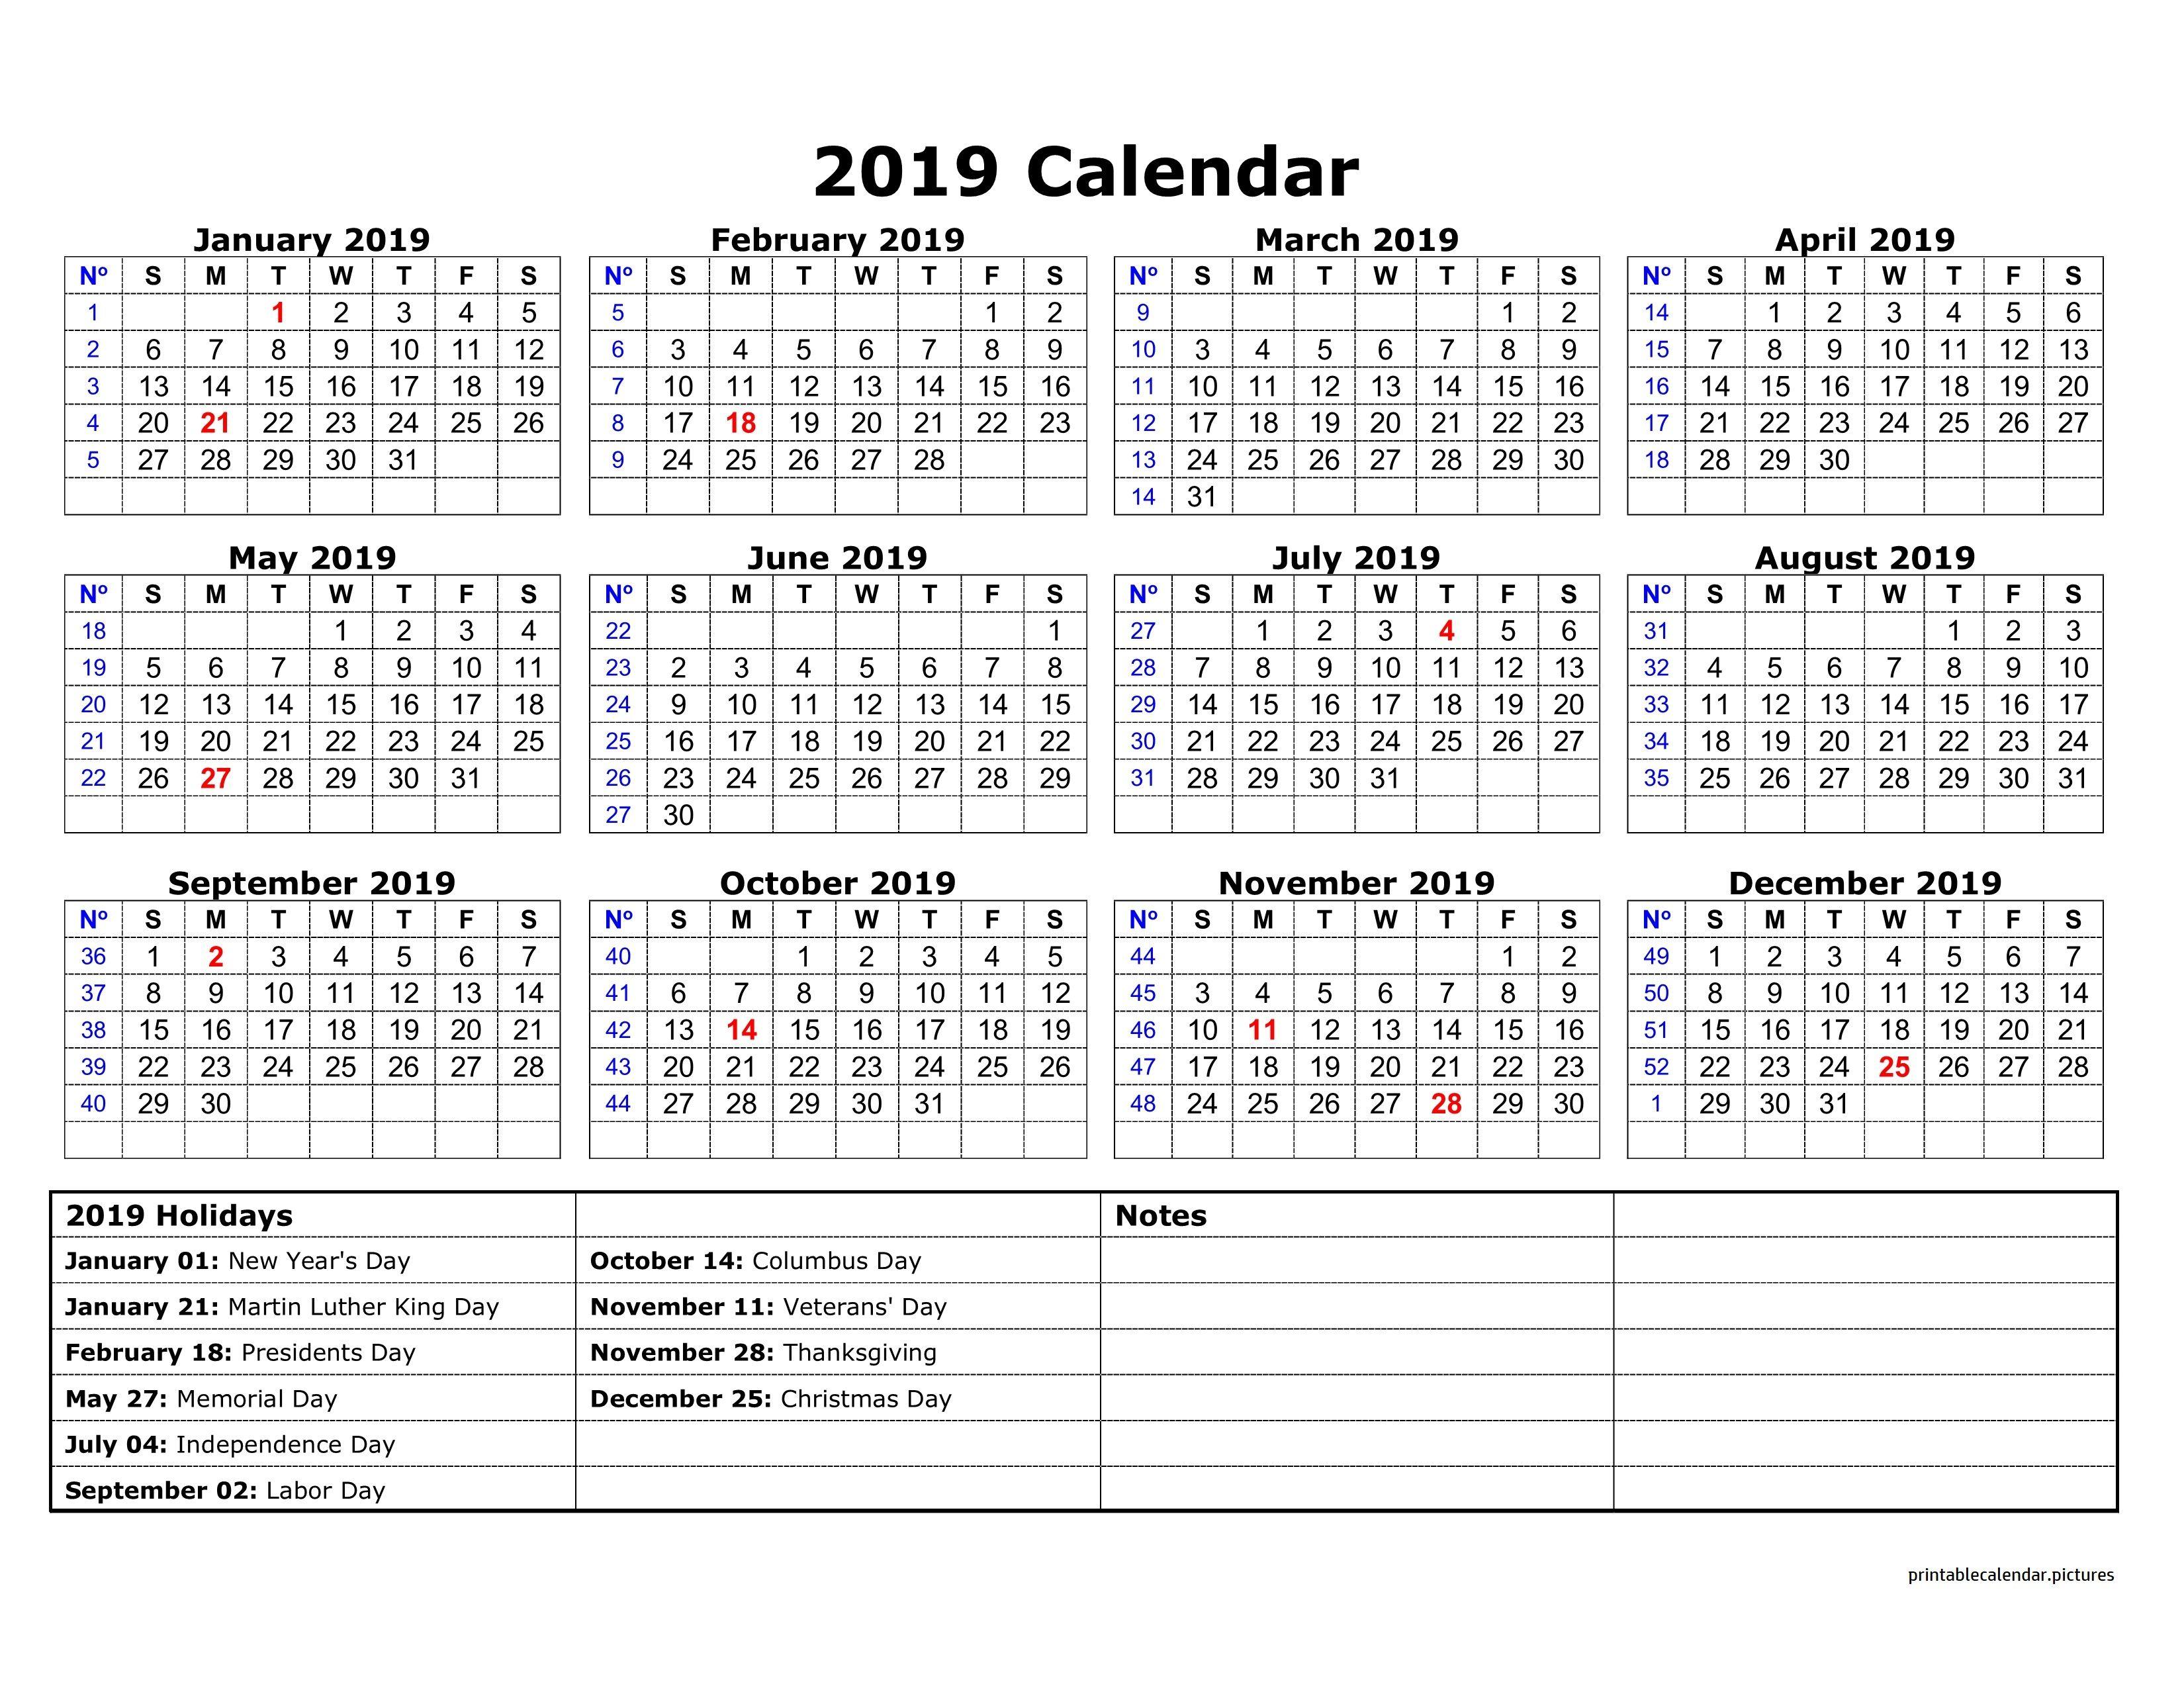 2019 Calendar Holidays Australia | 2019 Calendar Holidays | Free intended for Calendar With Holidays Templates